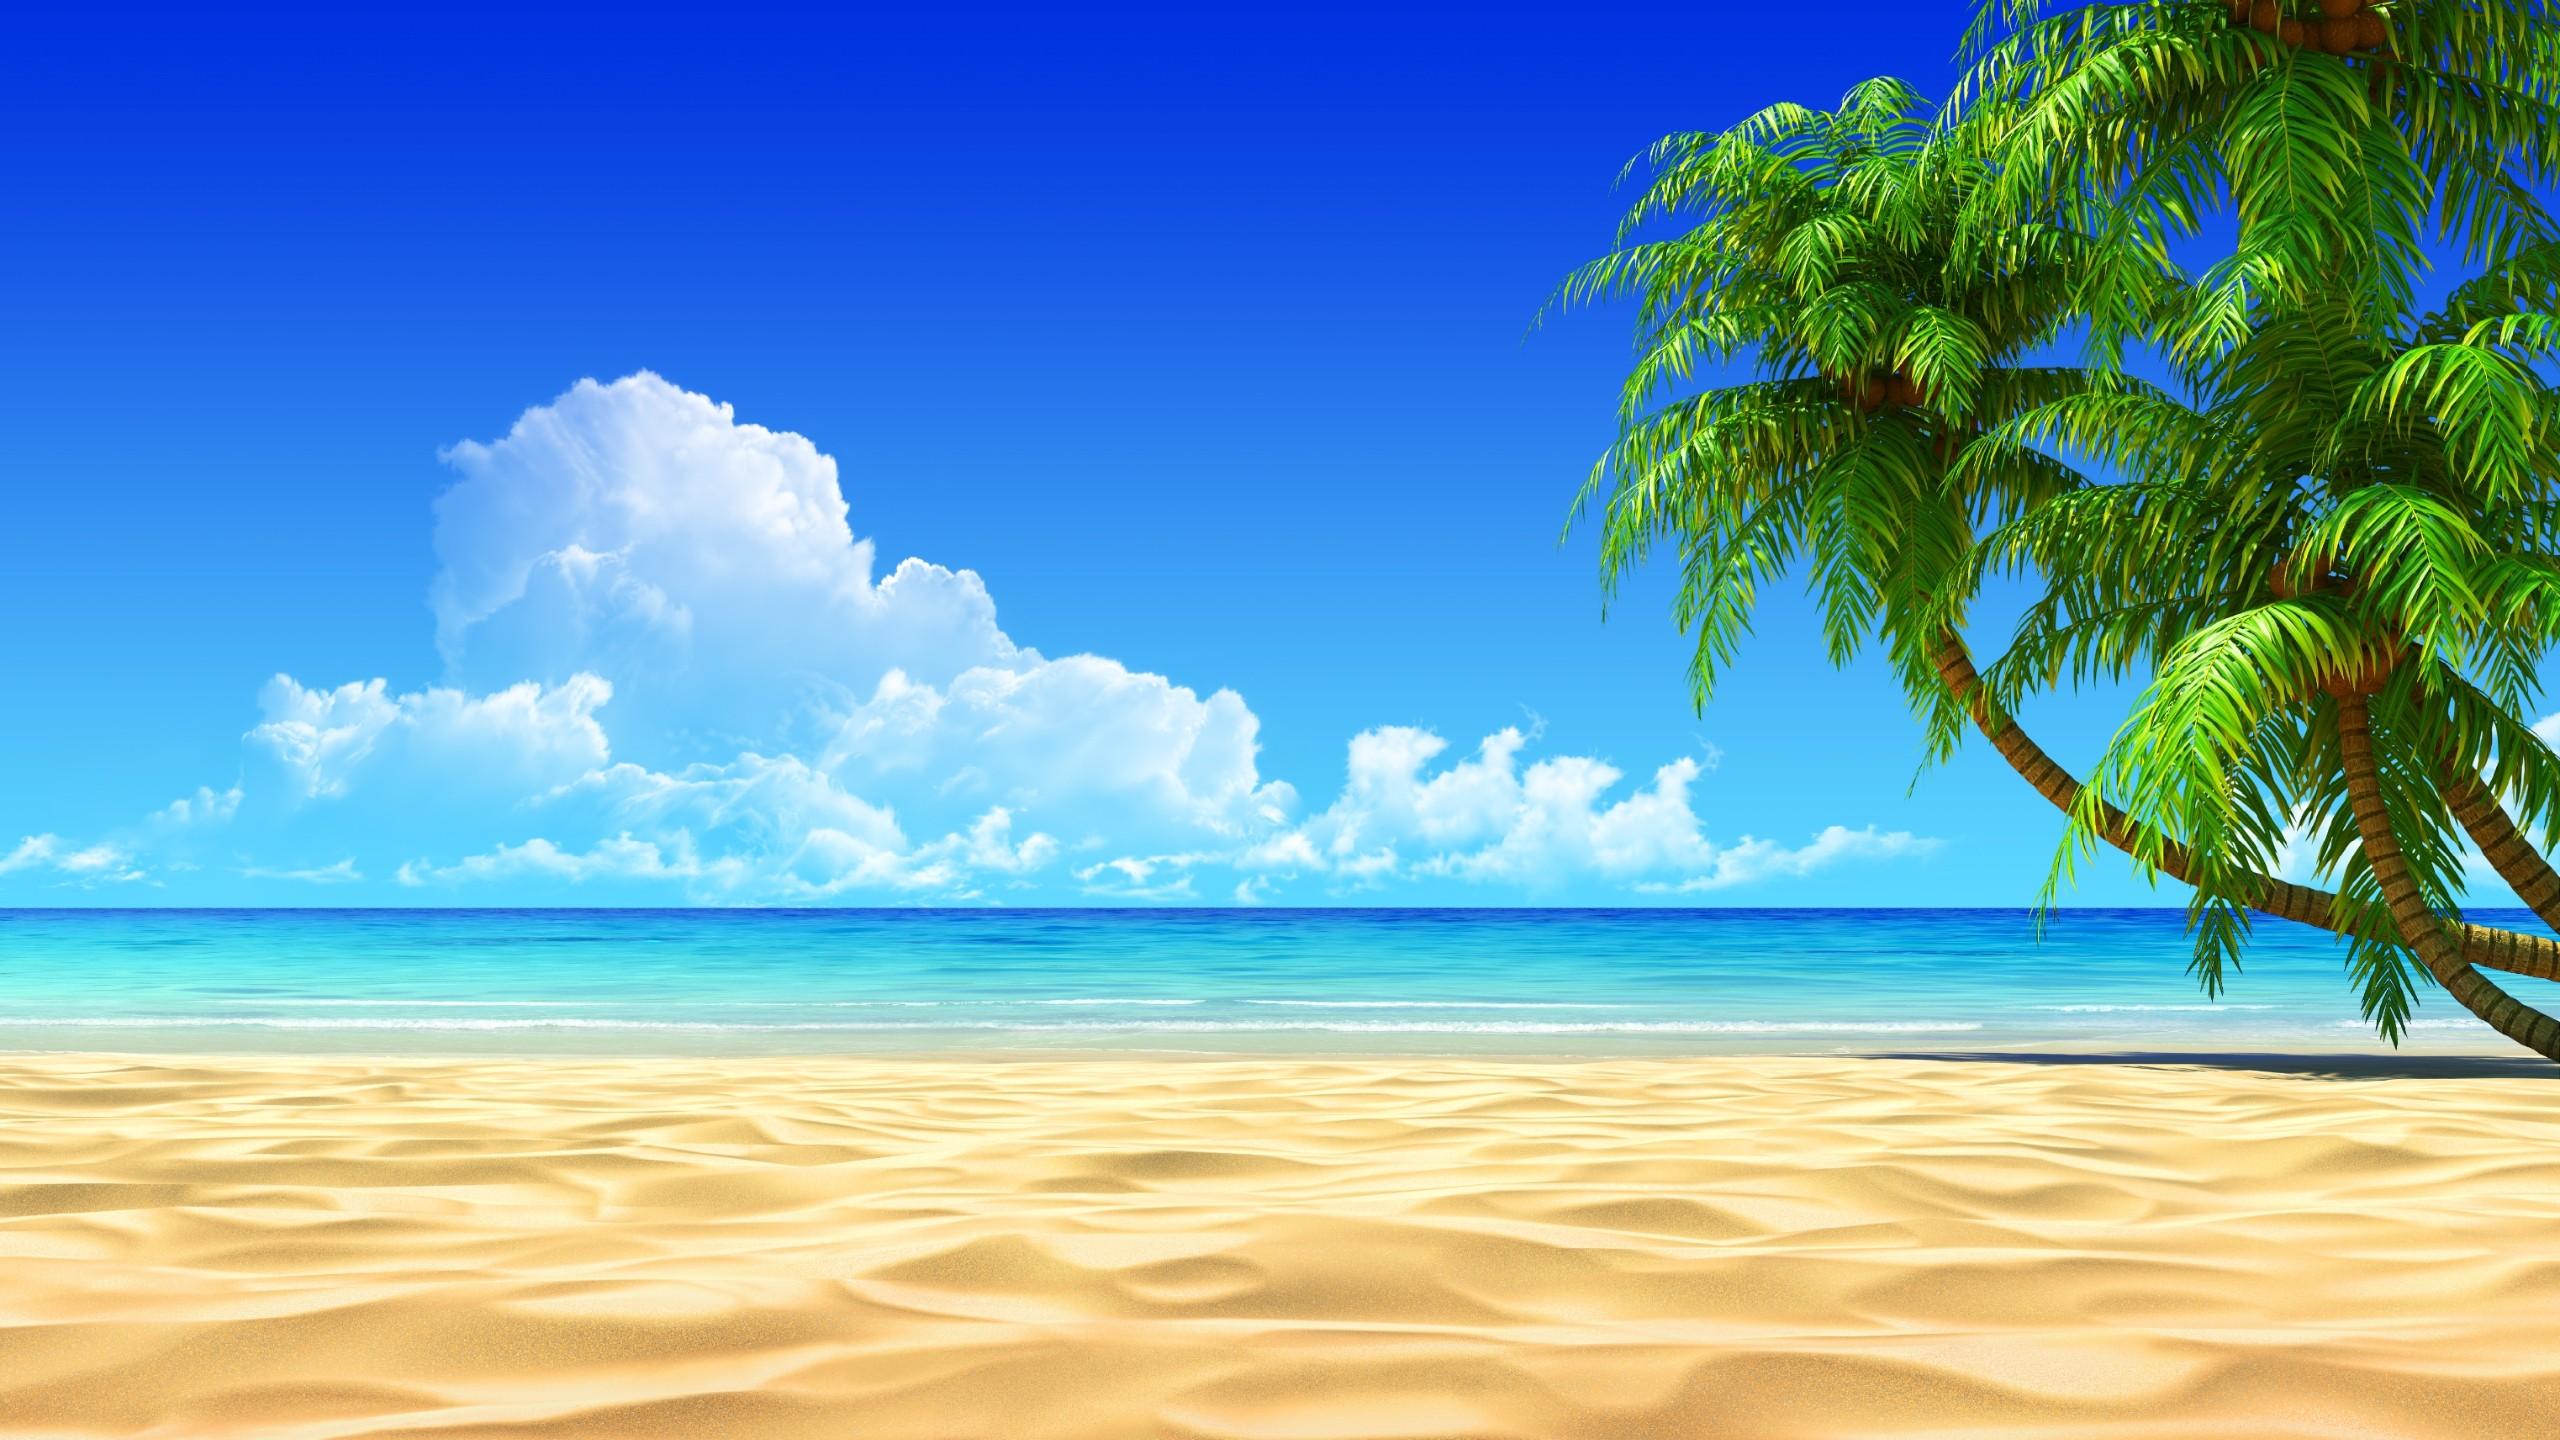 Wallpapers Desktop Background Full HD Download Mac 2560x1440 2560x1440